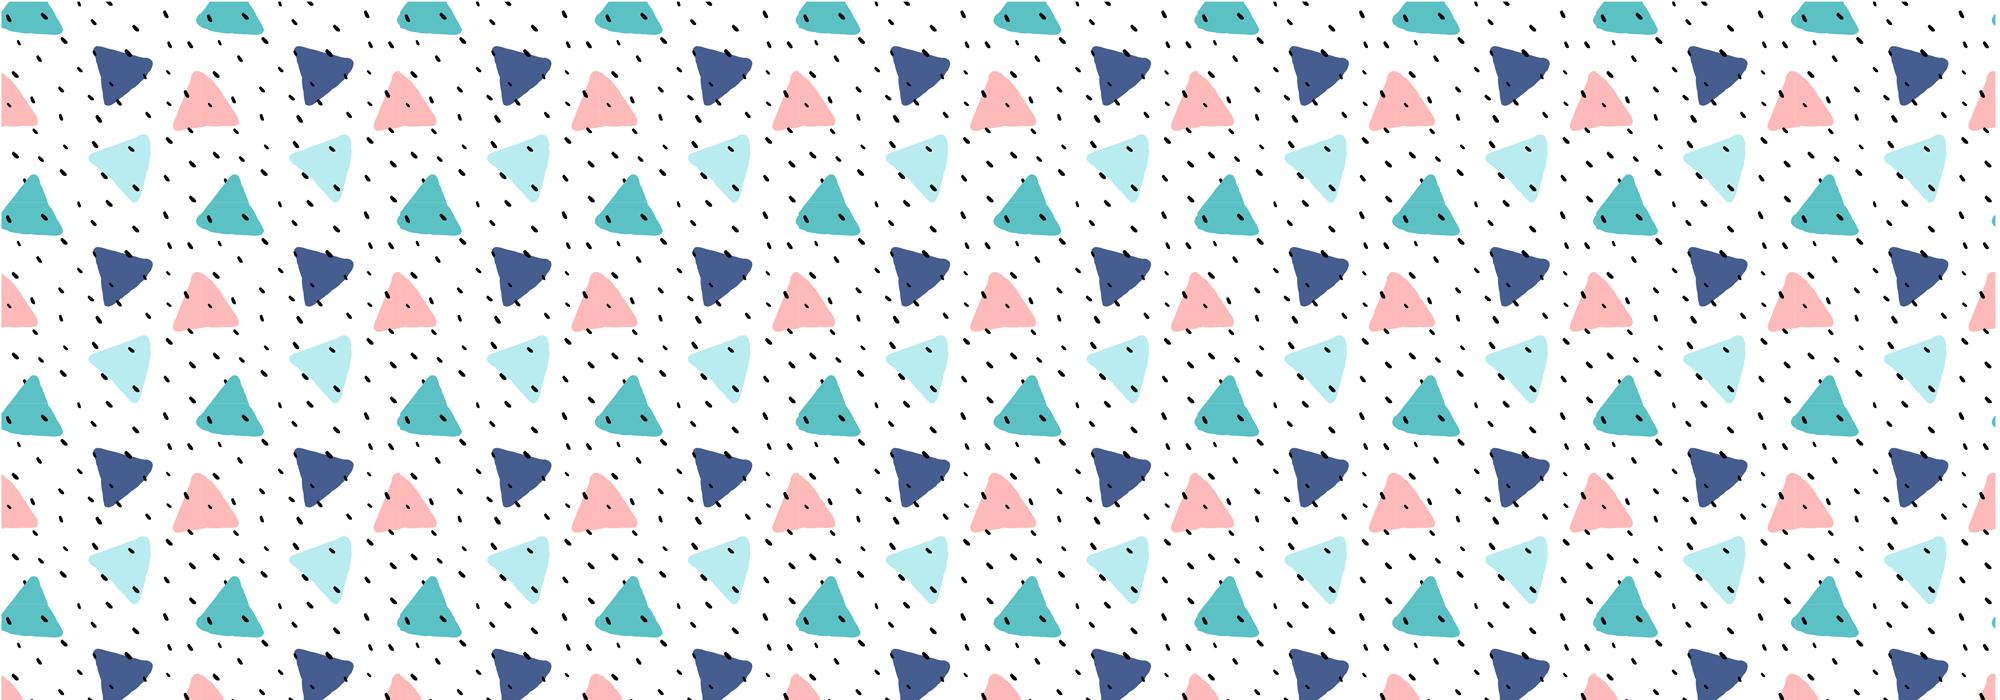 Pattern-2@4x-100_2.jpg